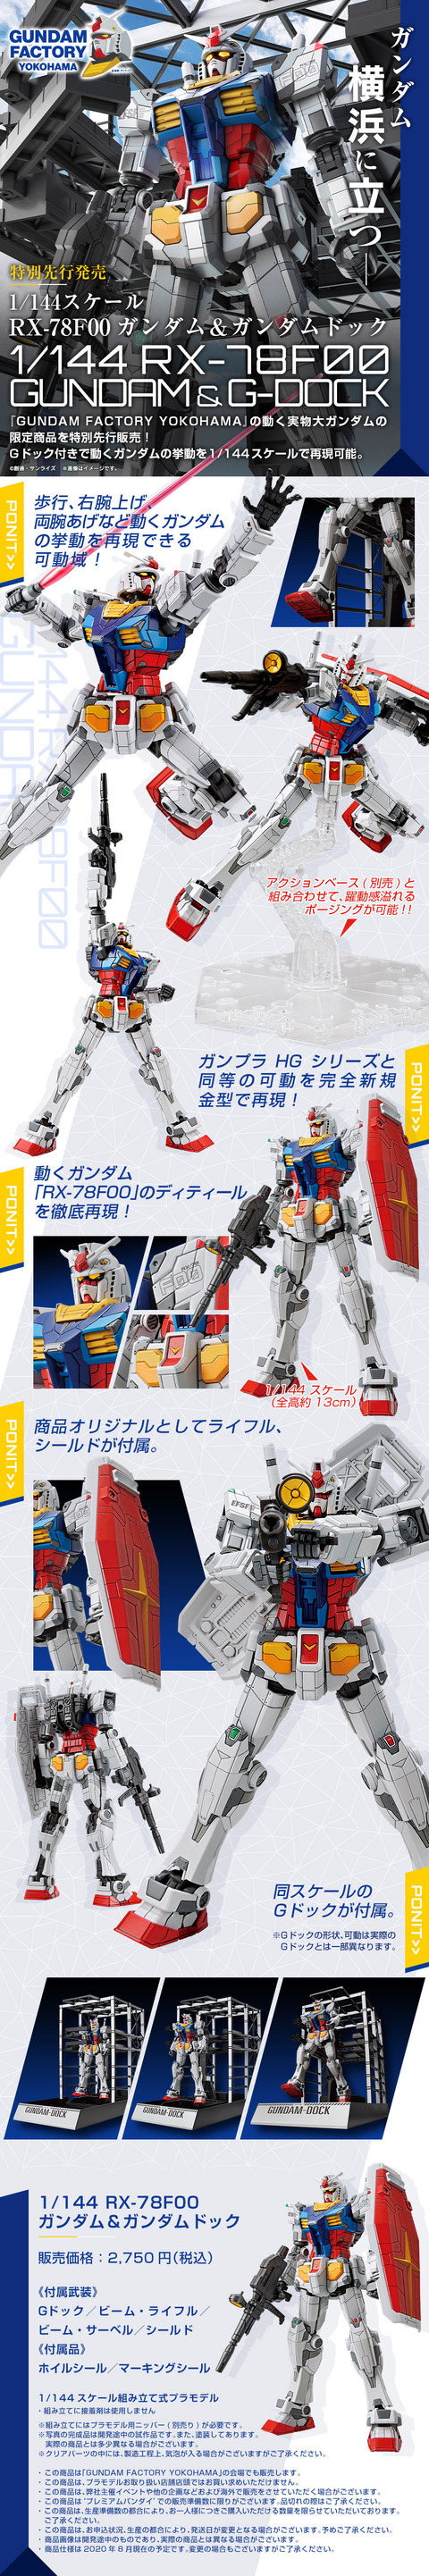 RX-78F00 1144 ガンダム_0